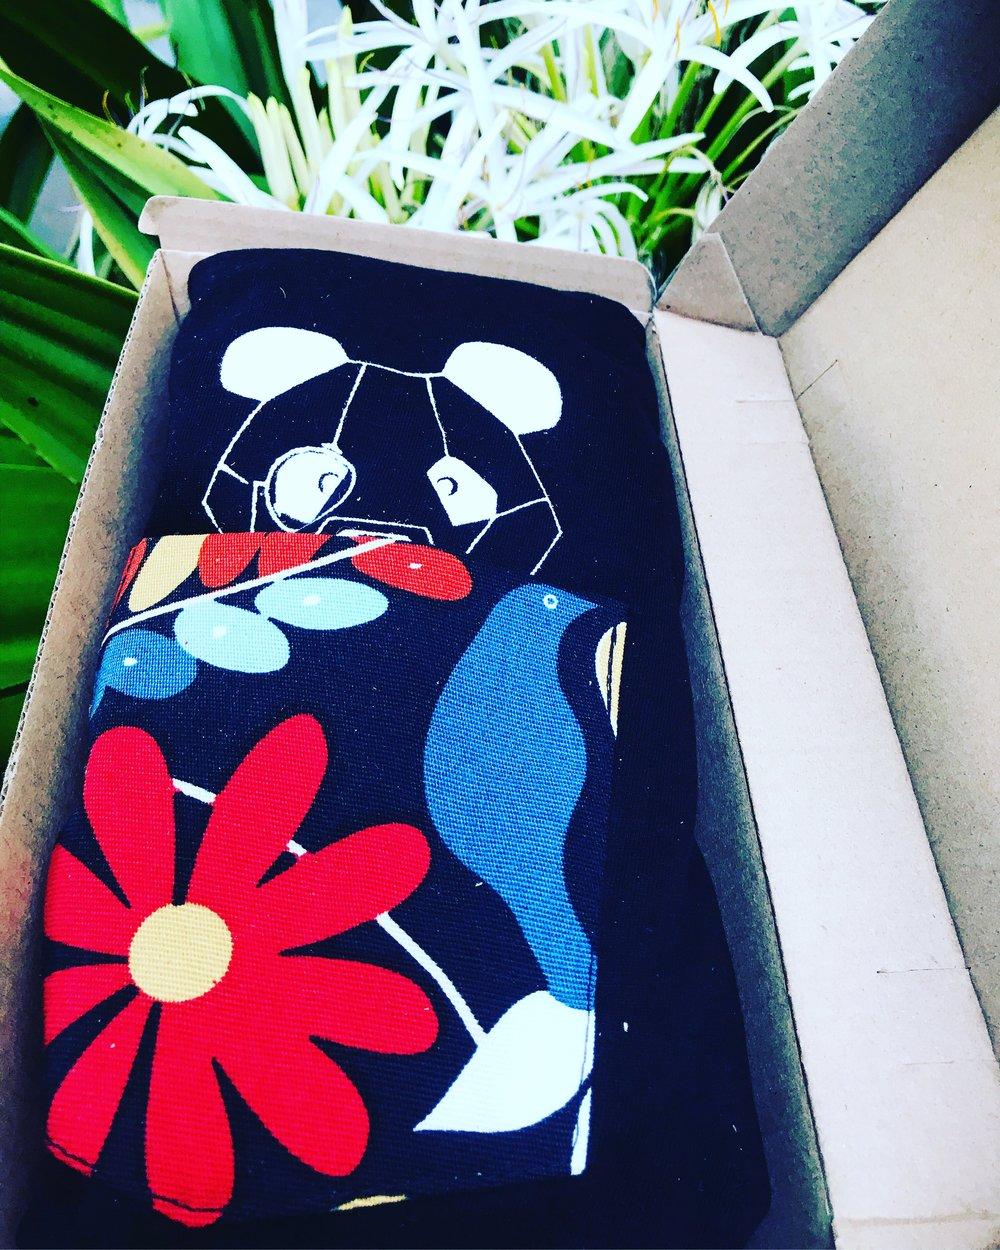 Panda to go!